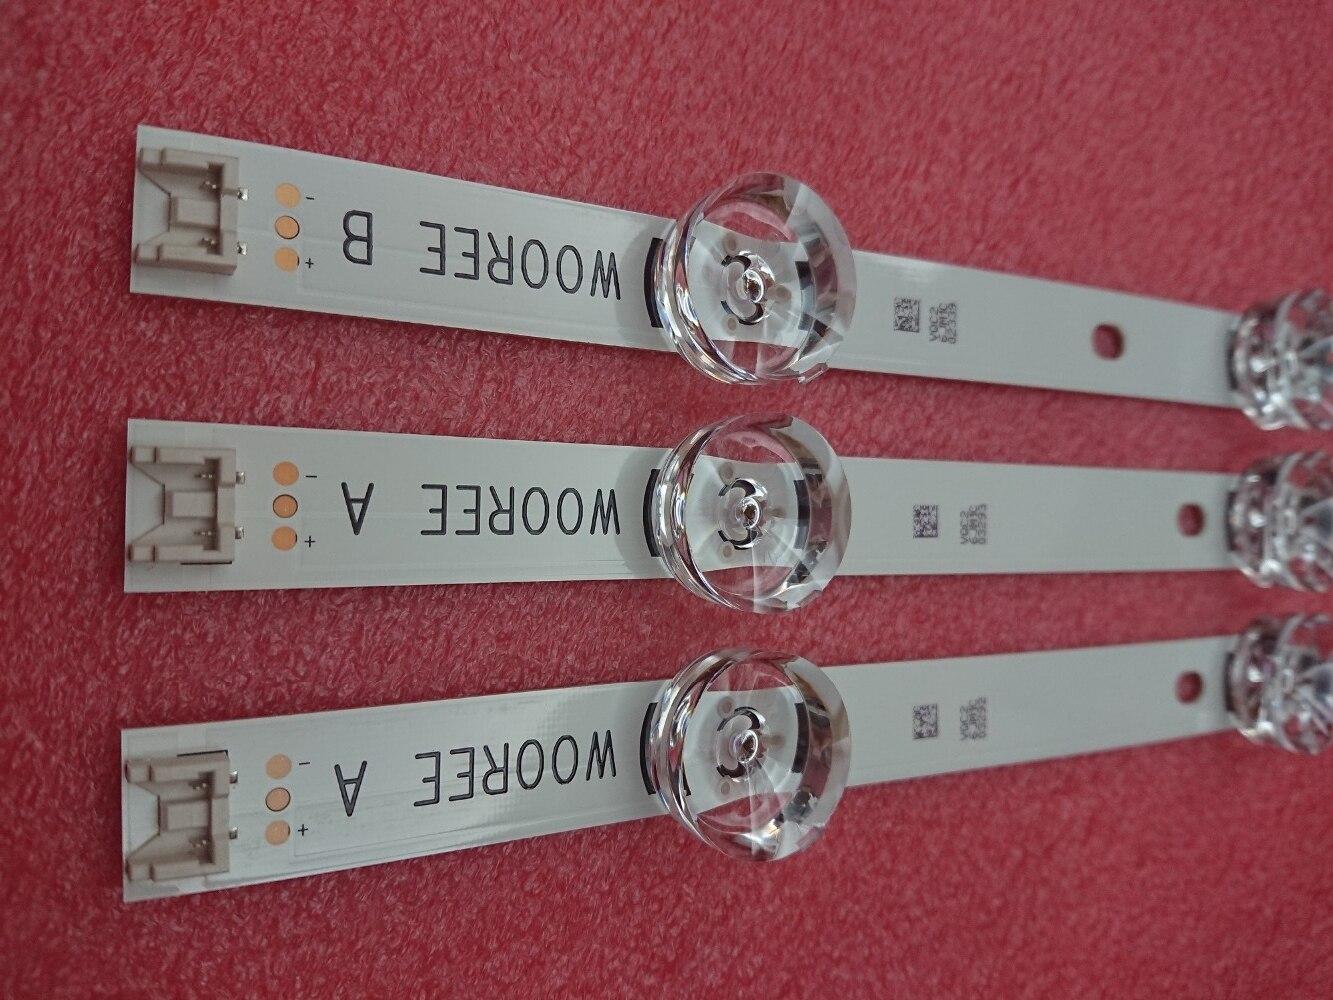 (Nuevo original) 3 piezas drt 3,0 32 pulgadas A B LED retroiluminación para LG TV 32LB5610 6916l-1974A 1975A 2224A 0419D innotek WOREE A B